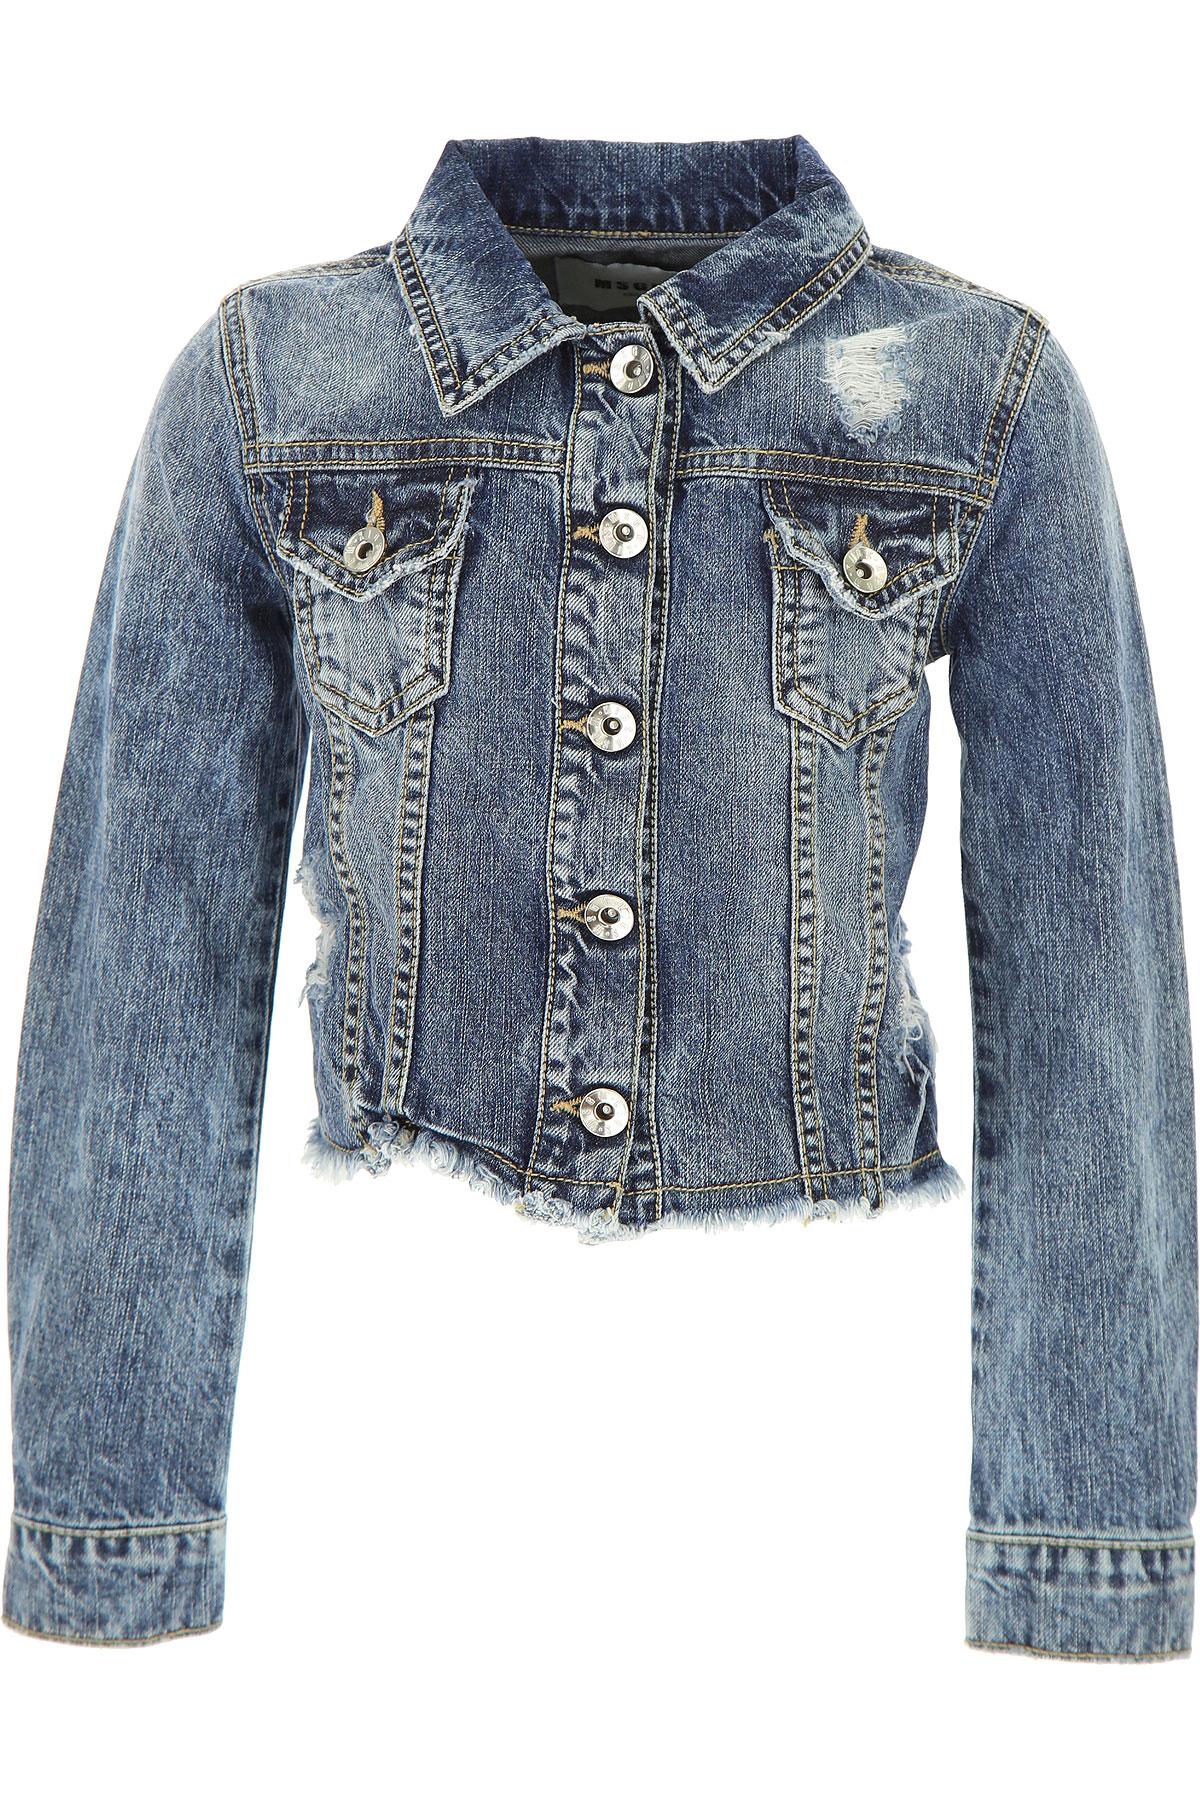 MSGM Kids Jacket for Girls On Sale in Outlet, Denim Blue, Cotton, 2017, 10Y 6Y